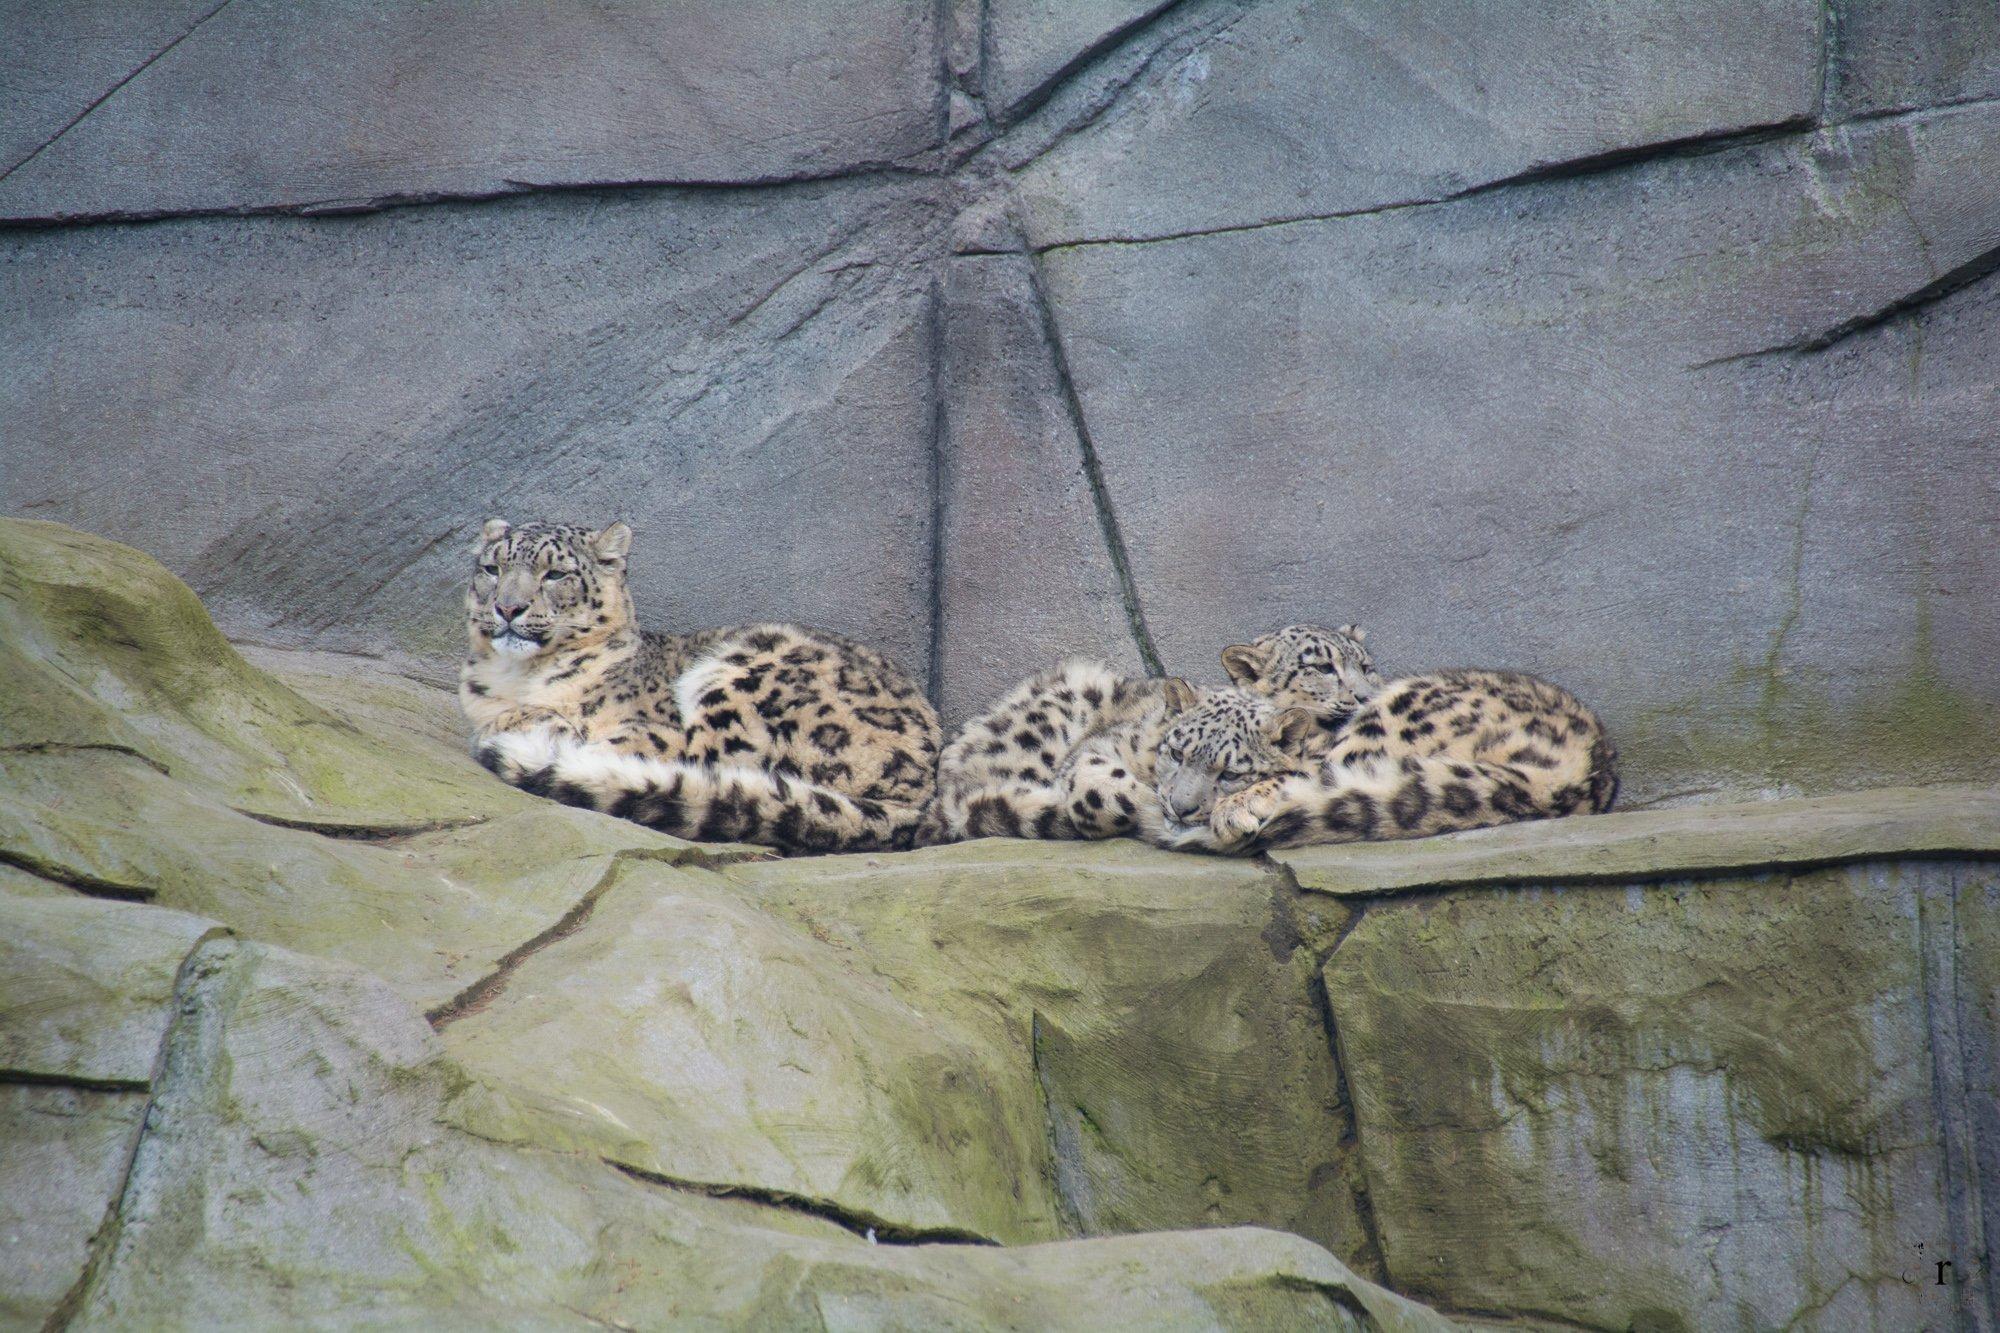 Neunkircher Zoo - Schneeleoparden